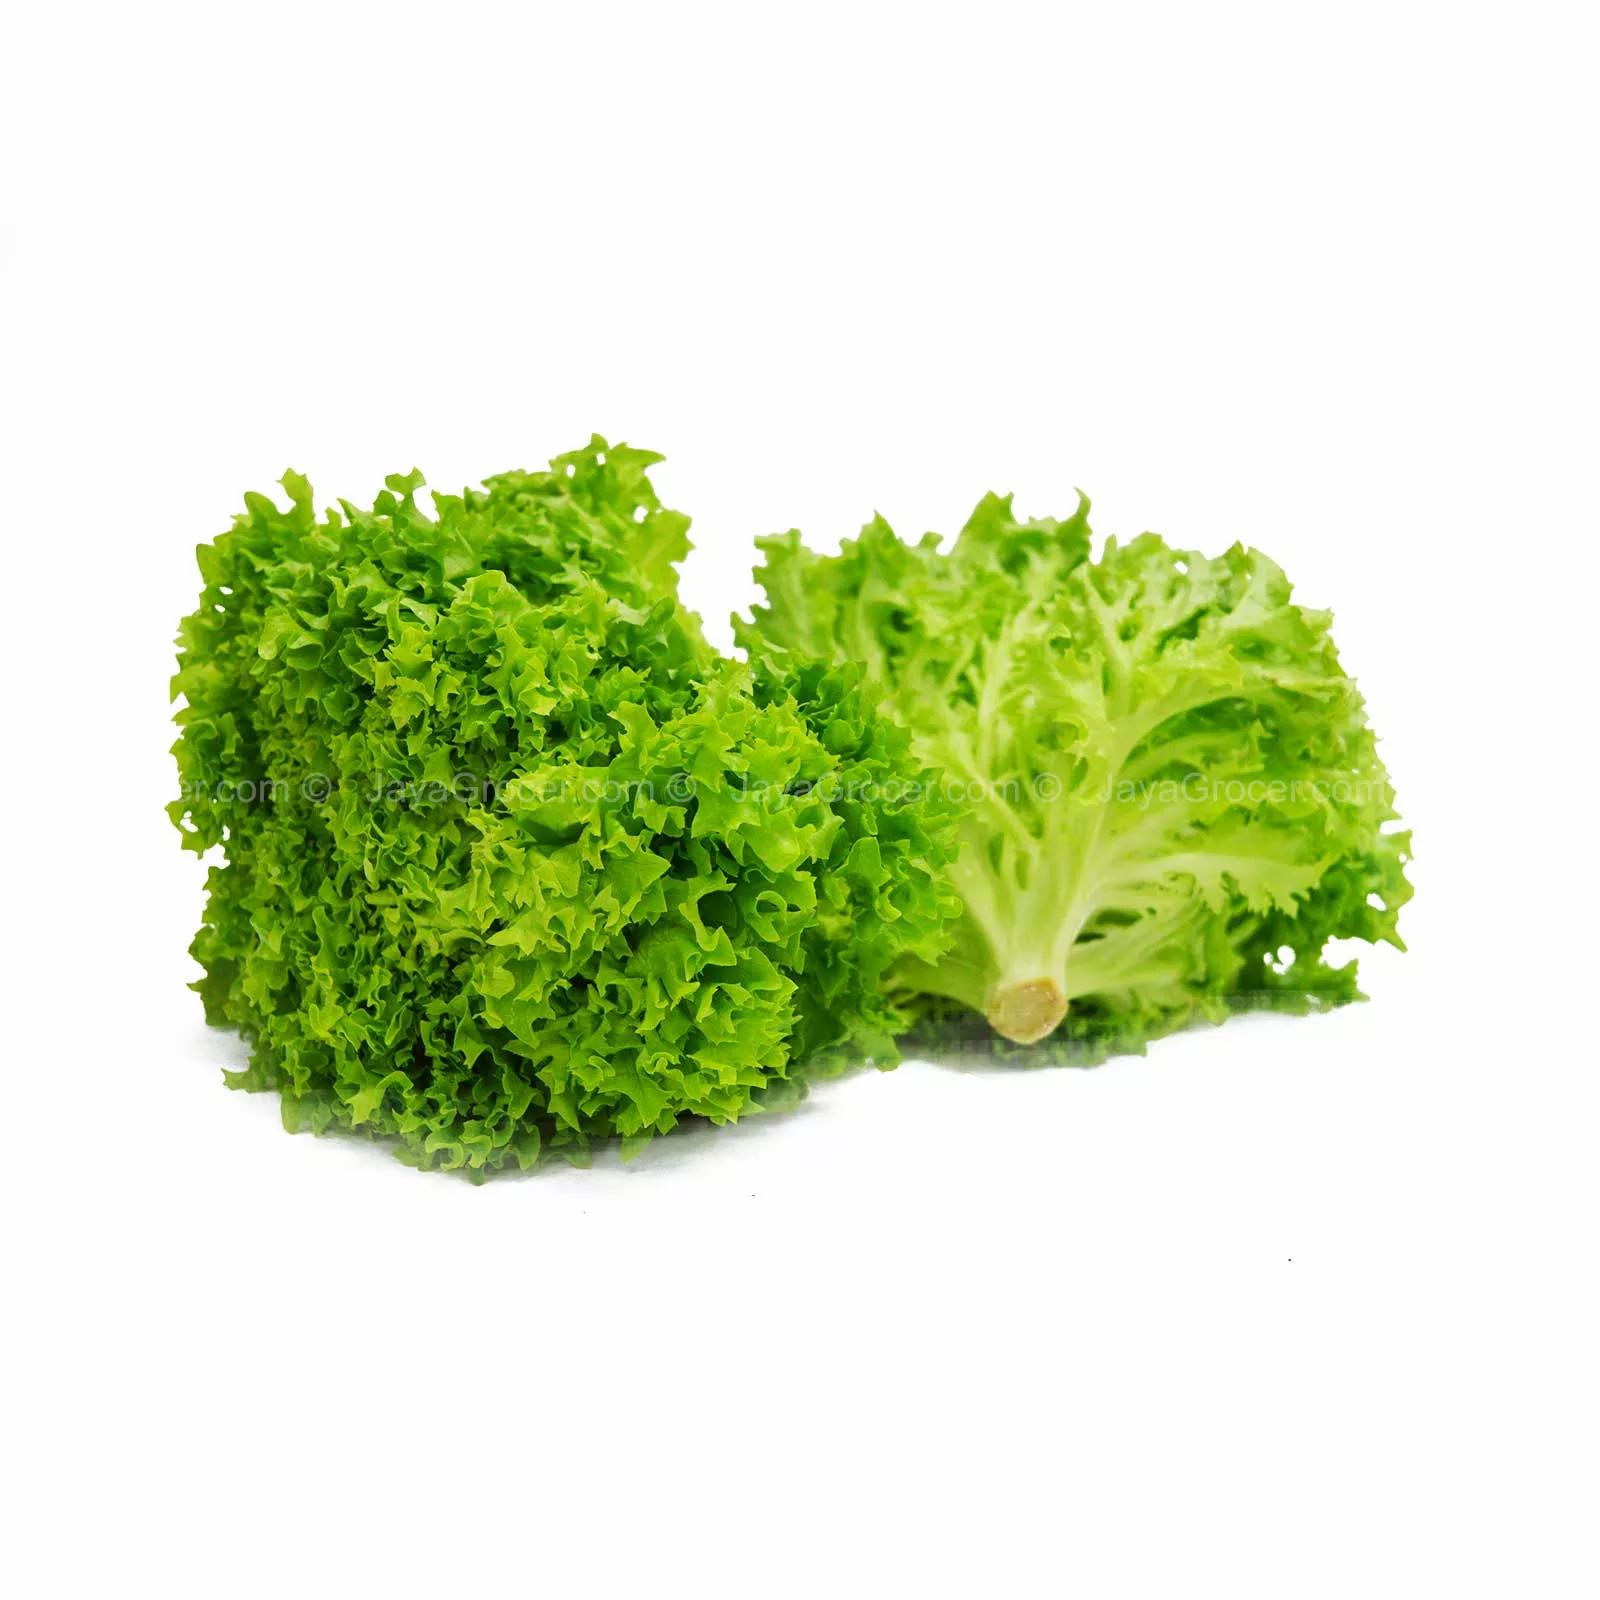 green coral lettuce